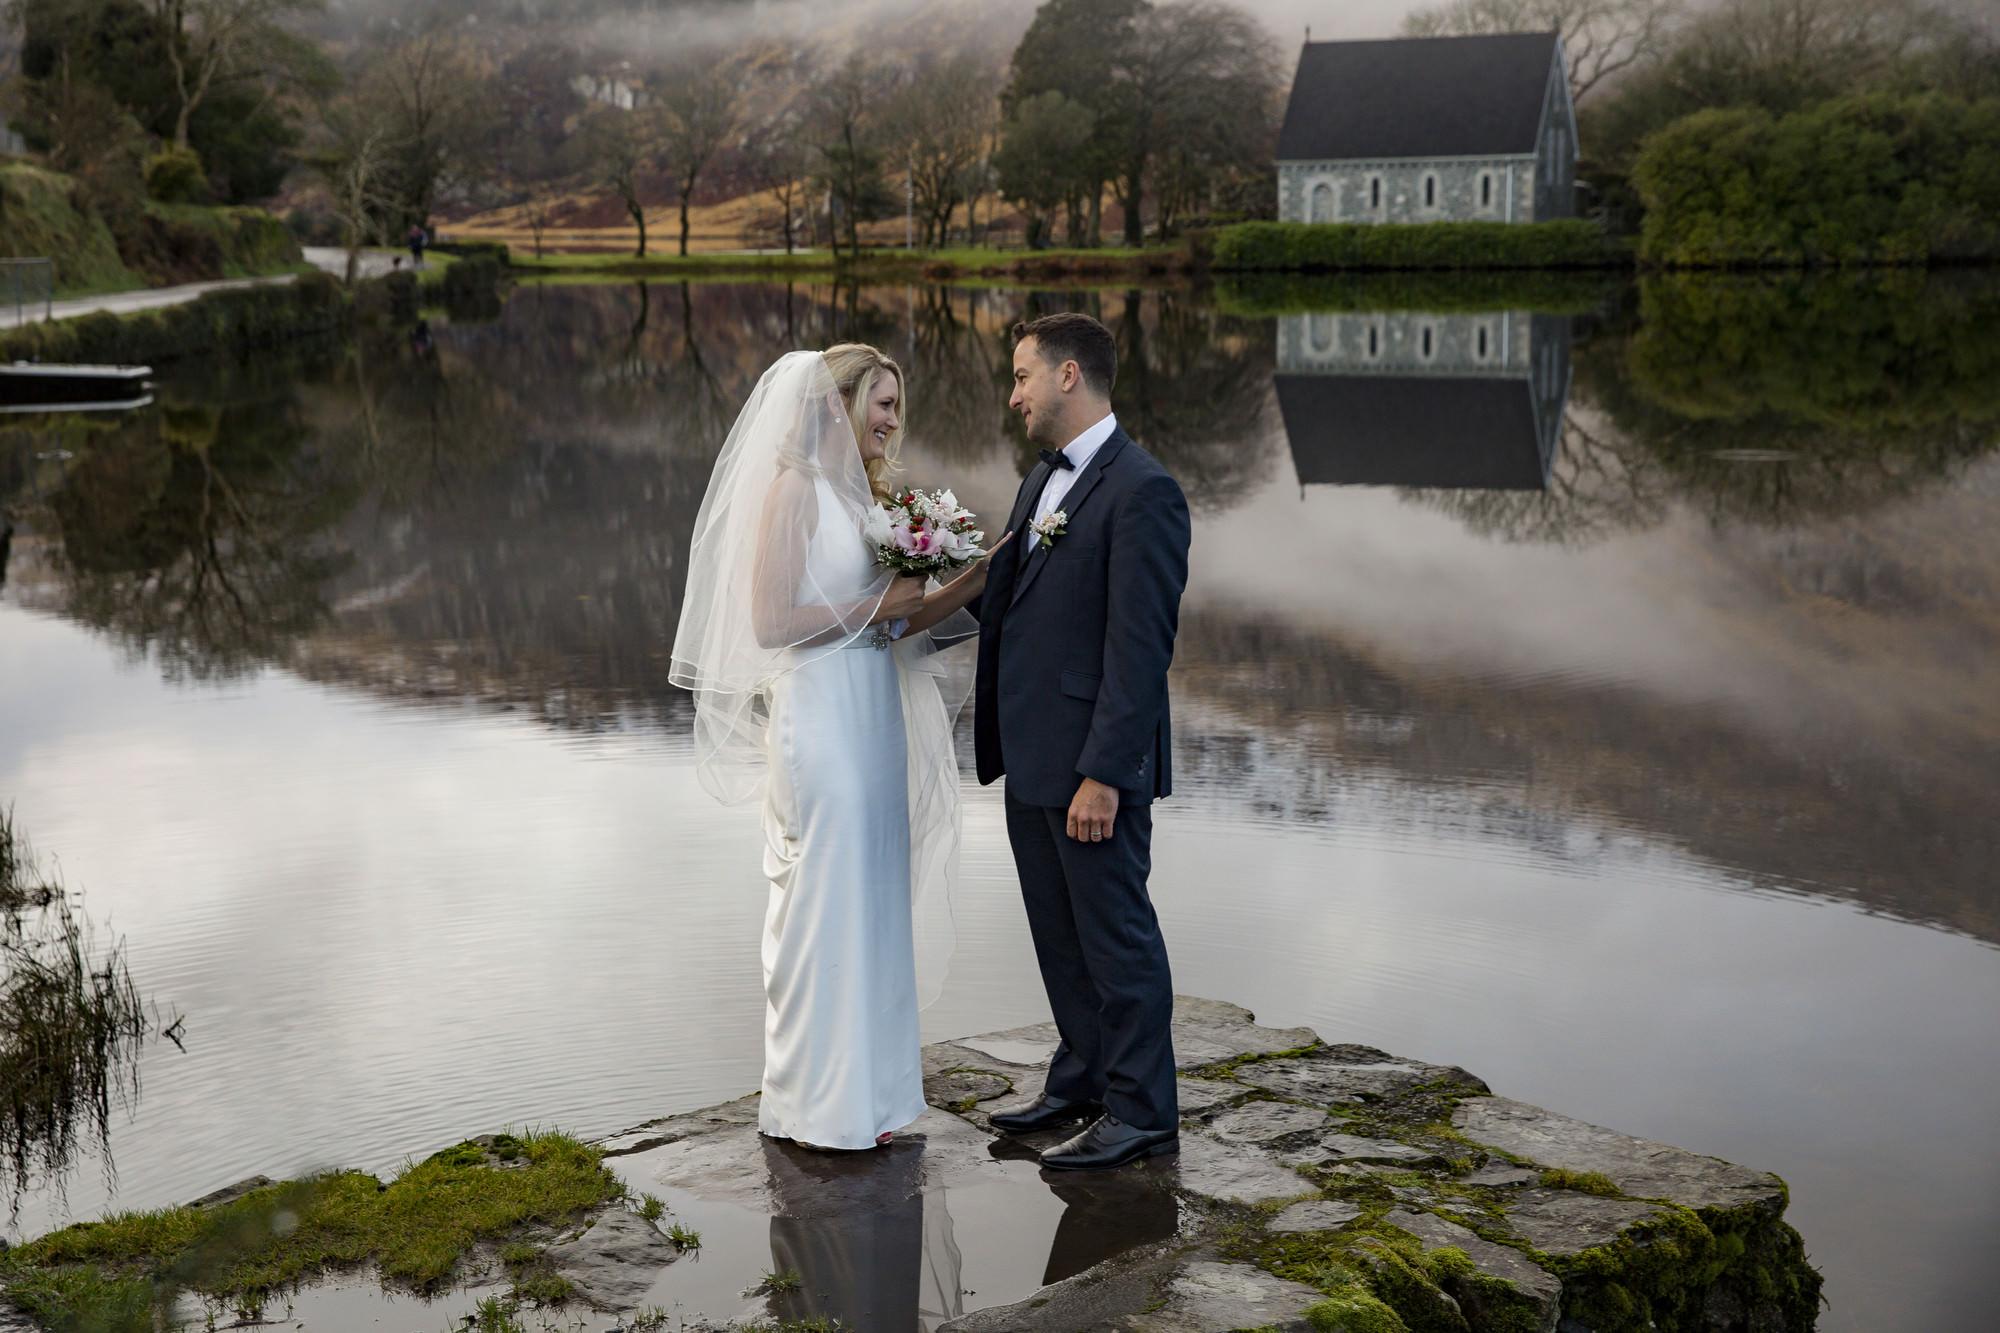 muckross_park_hotel_grougane_barra_wedding_photographer_goldenmoments_054.jpg